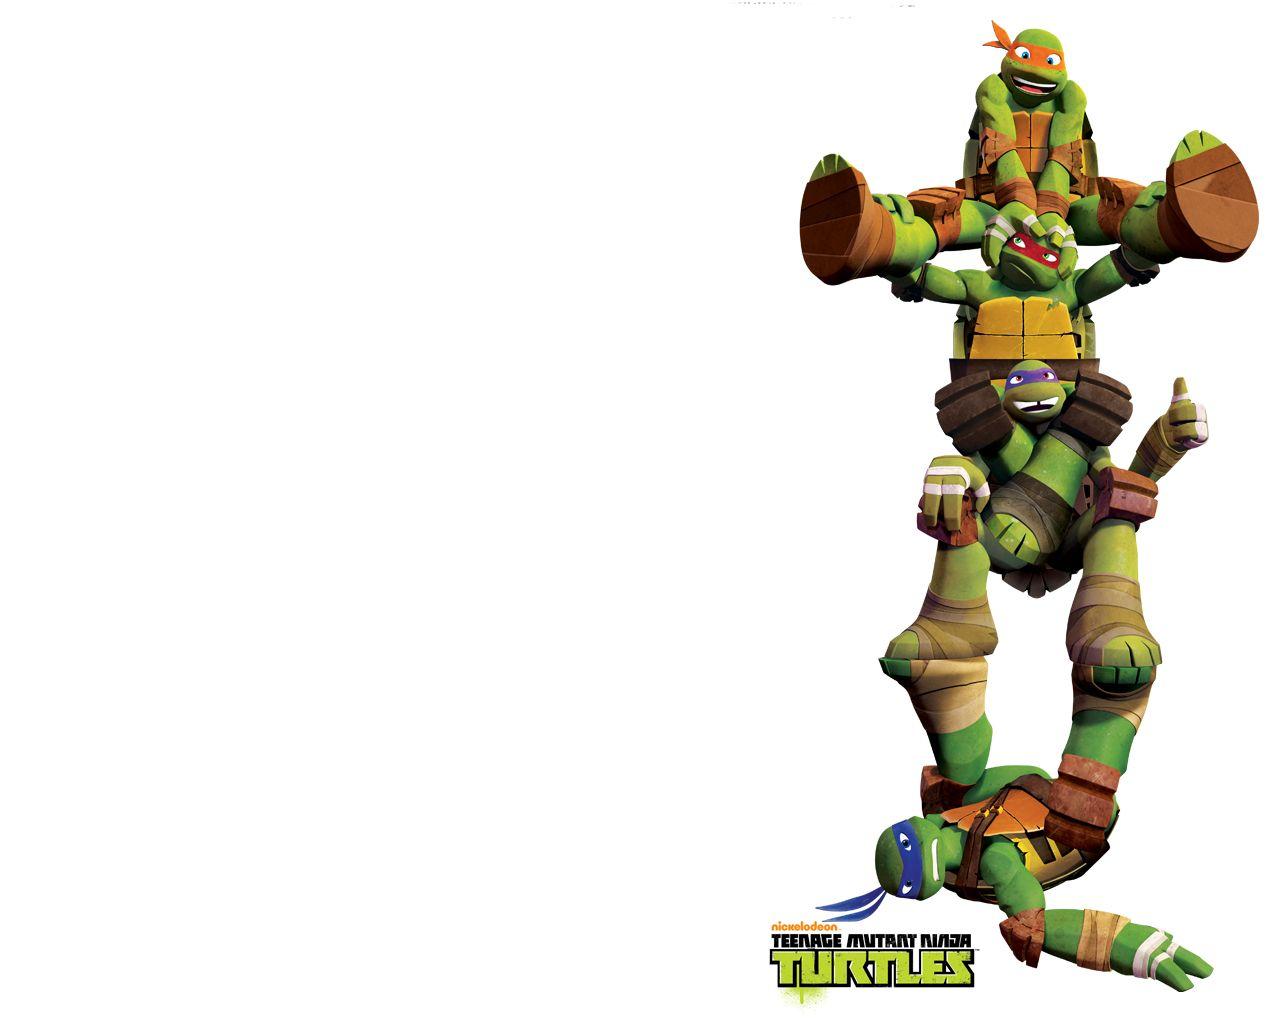 Nickelodeon Europe Unveils Exclusive Teenage Mutant Ninja Turtles PicturesTmnt WallpaperNinga